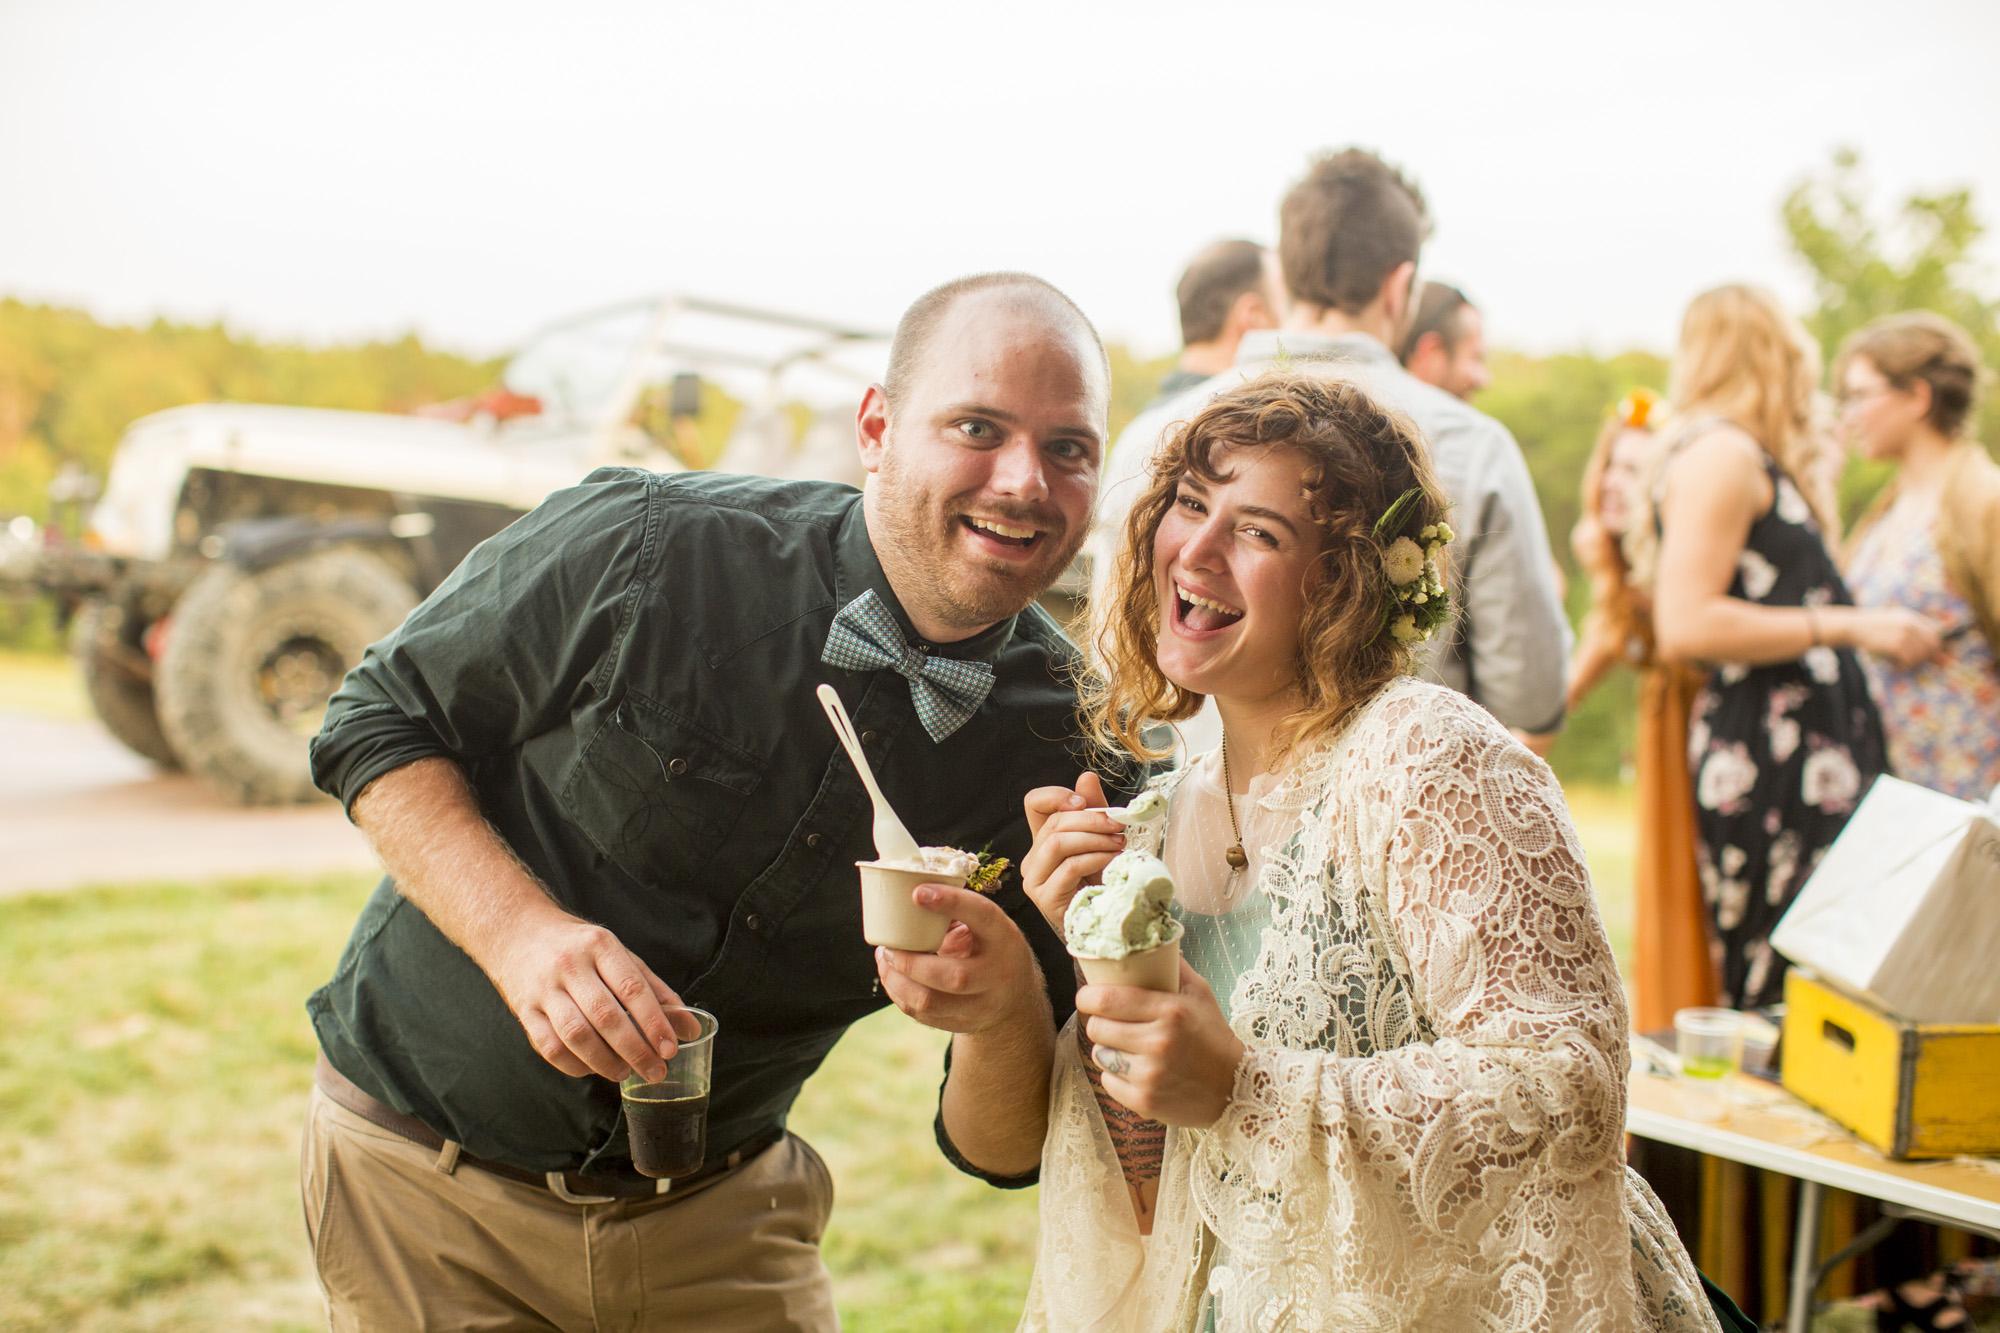 Seriously_Sabrina_Photography_Red_River_Gorge_Kentucky_Wedding_ShawnDana189.jpg